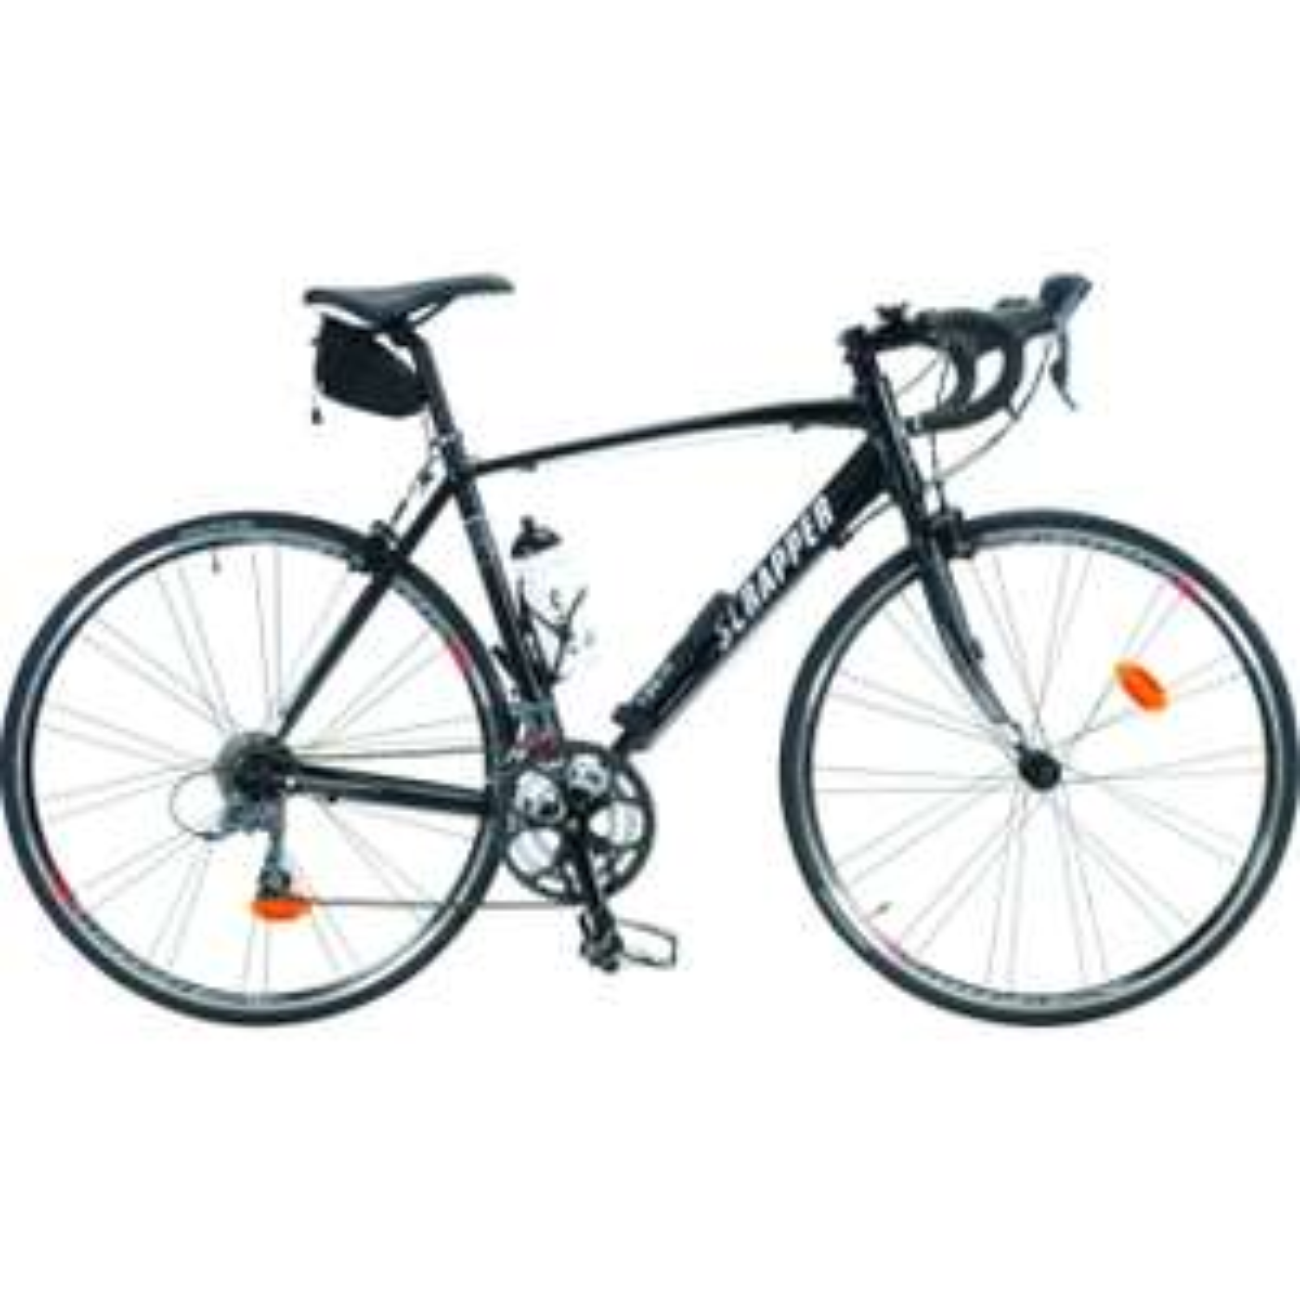 Vélo Scrapper Spego 110 1.6 LTD (Tailles au choix)